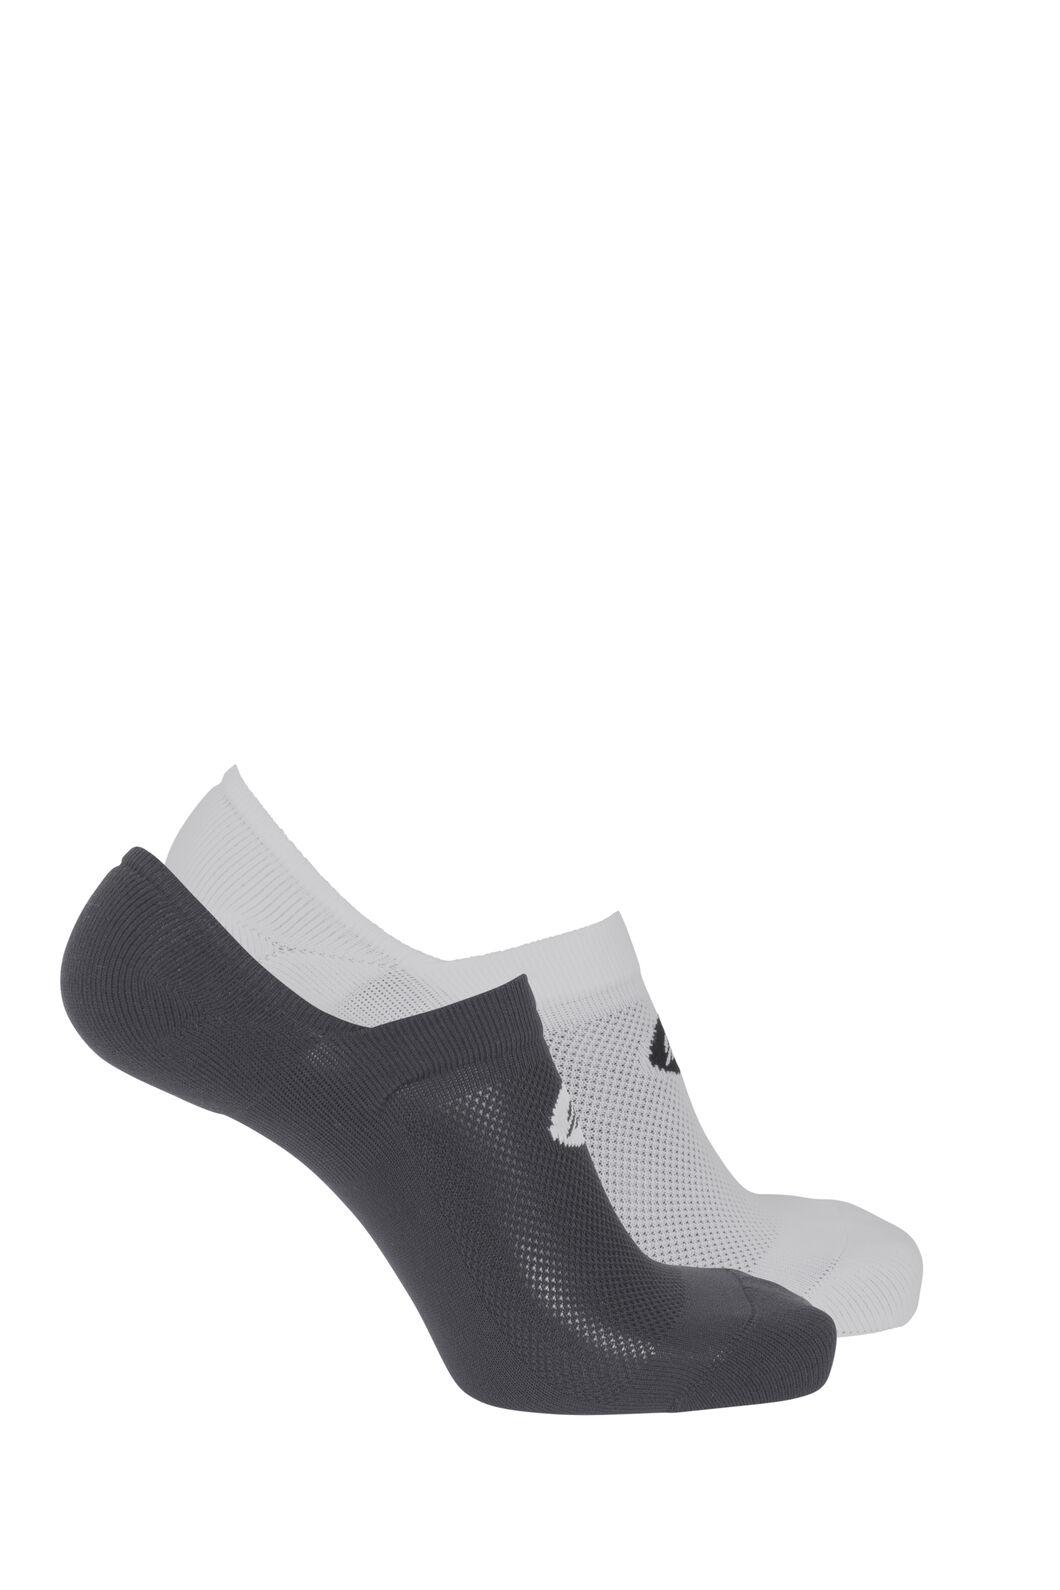 Macpac Invisible Socks (2 Pack), Black/White, hi-res